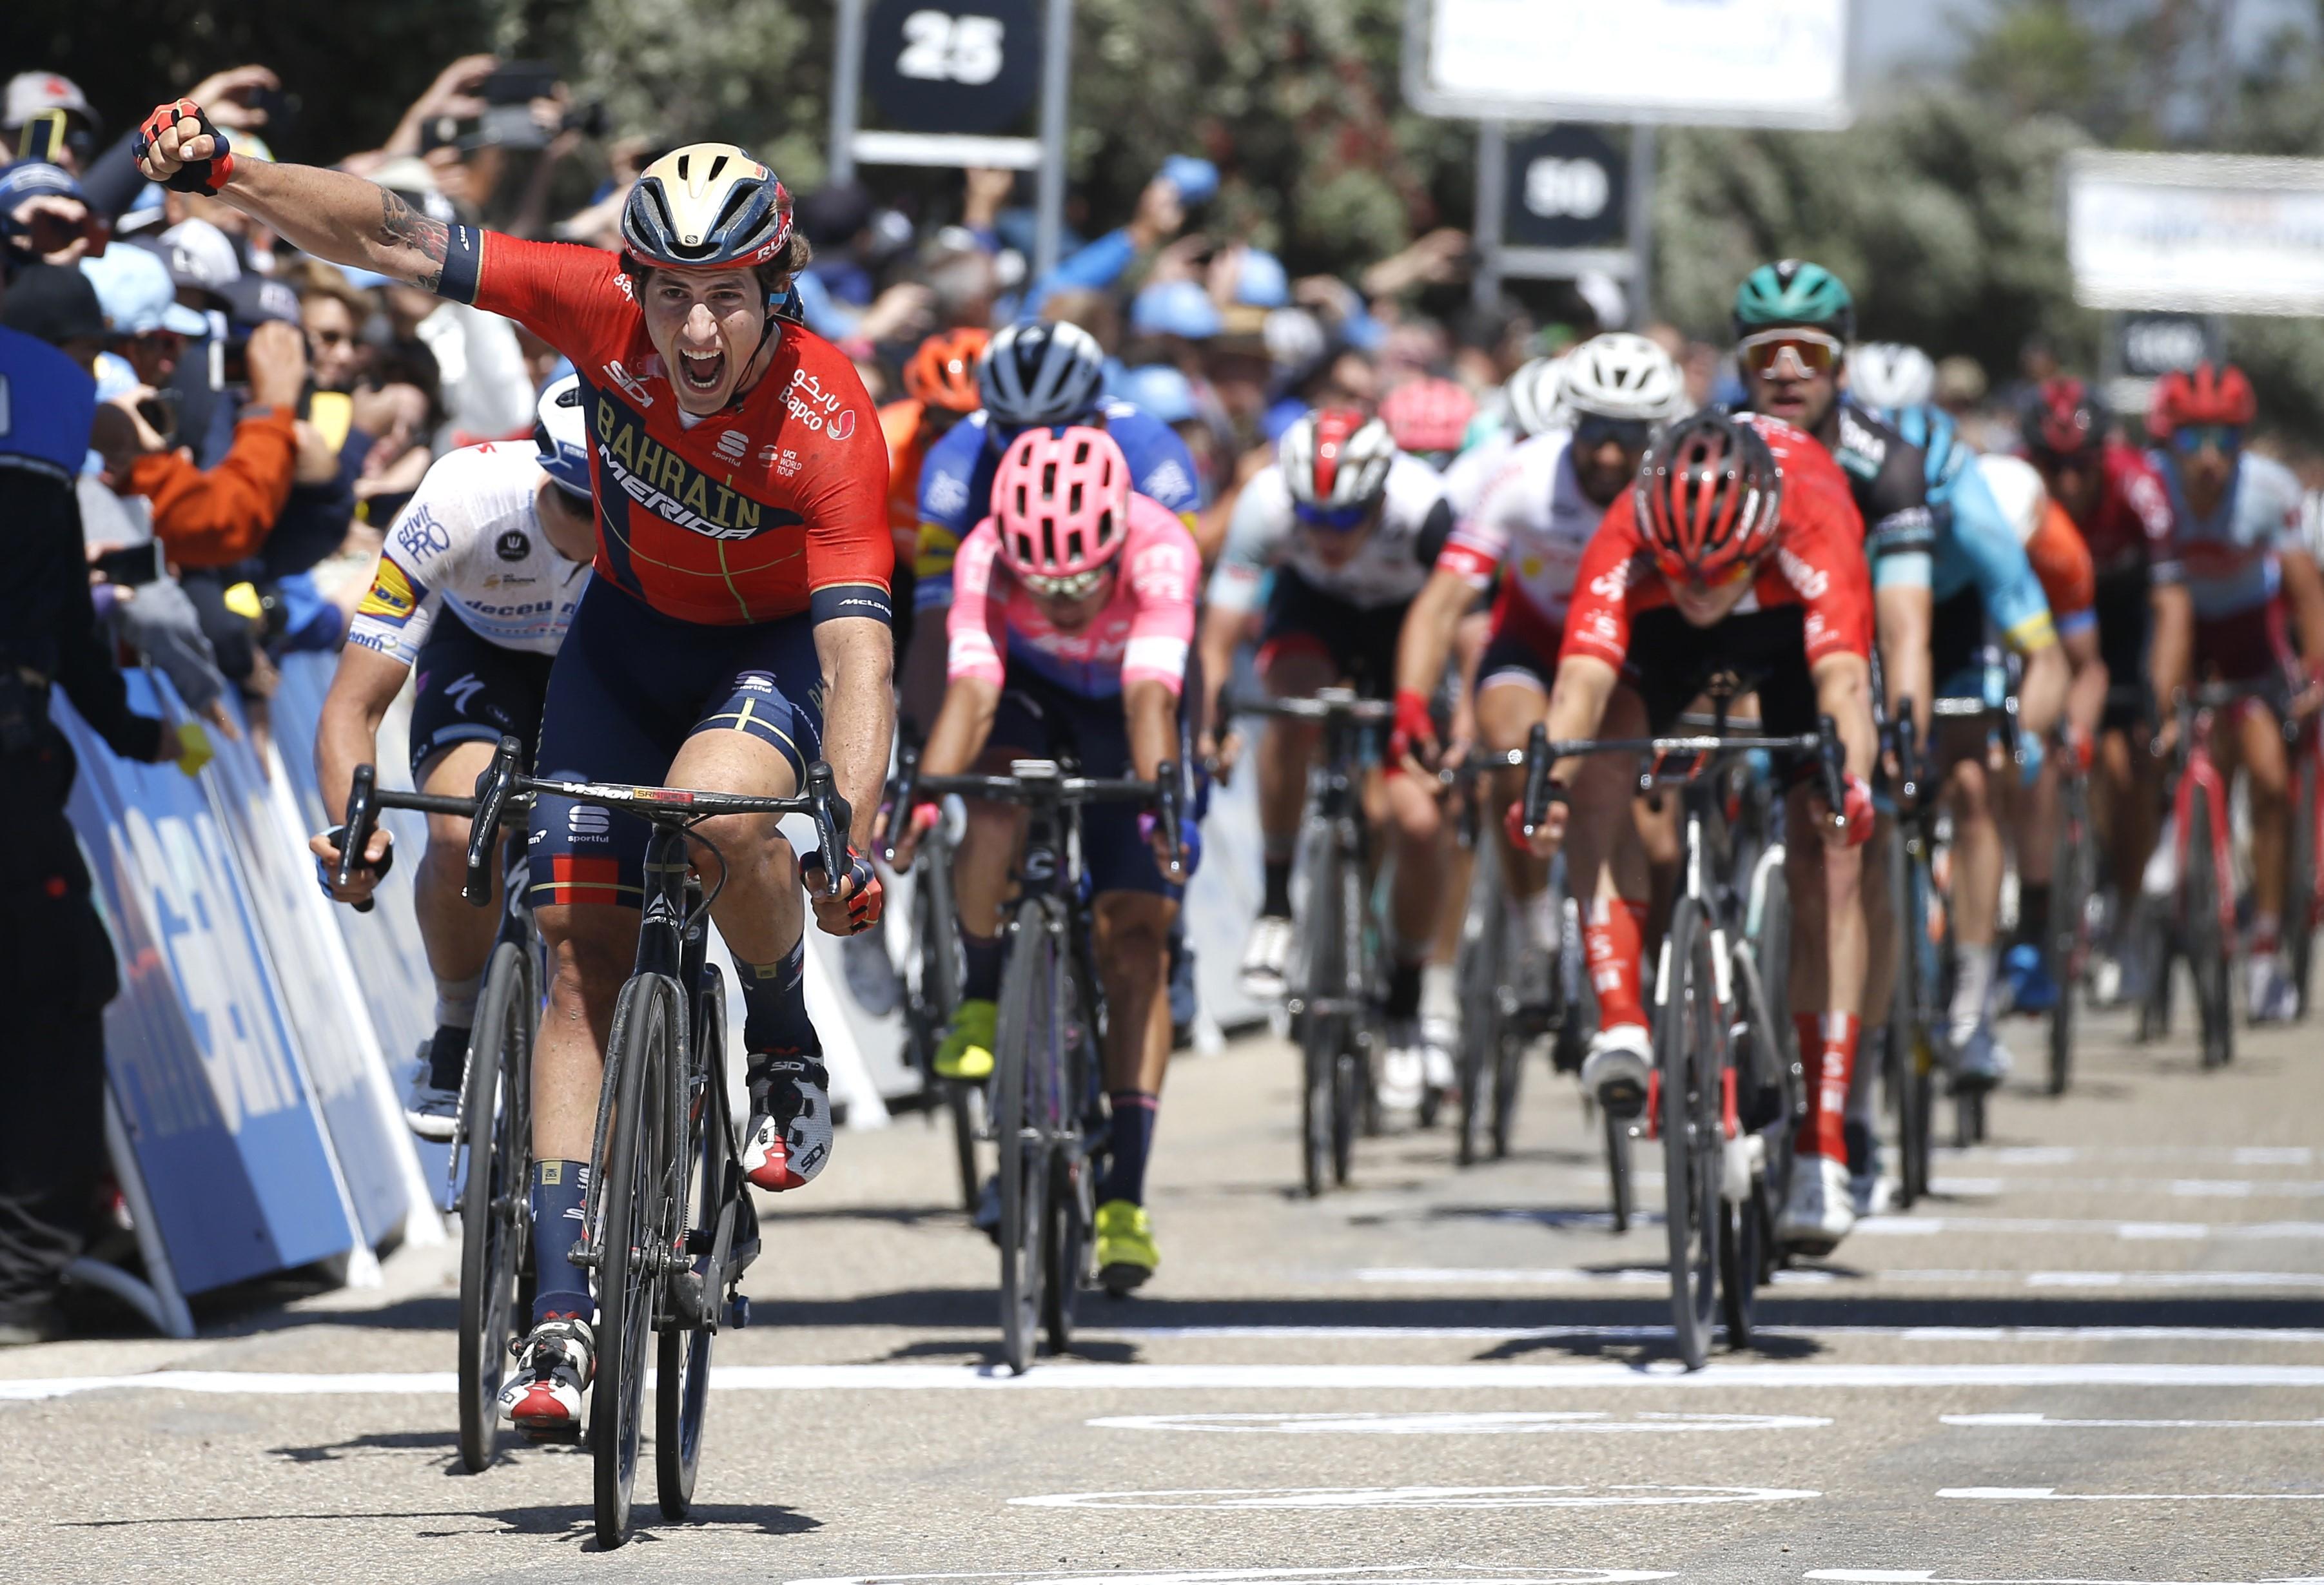 Ivan Garcia Cortina (Team Bahrain - Merida) vainqueur de la 5e étape du Tour de Californie 2019